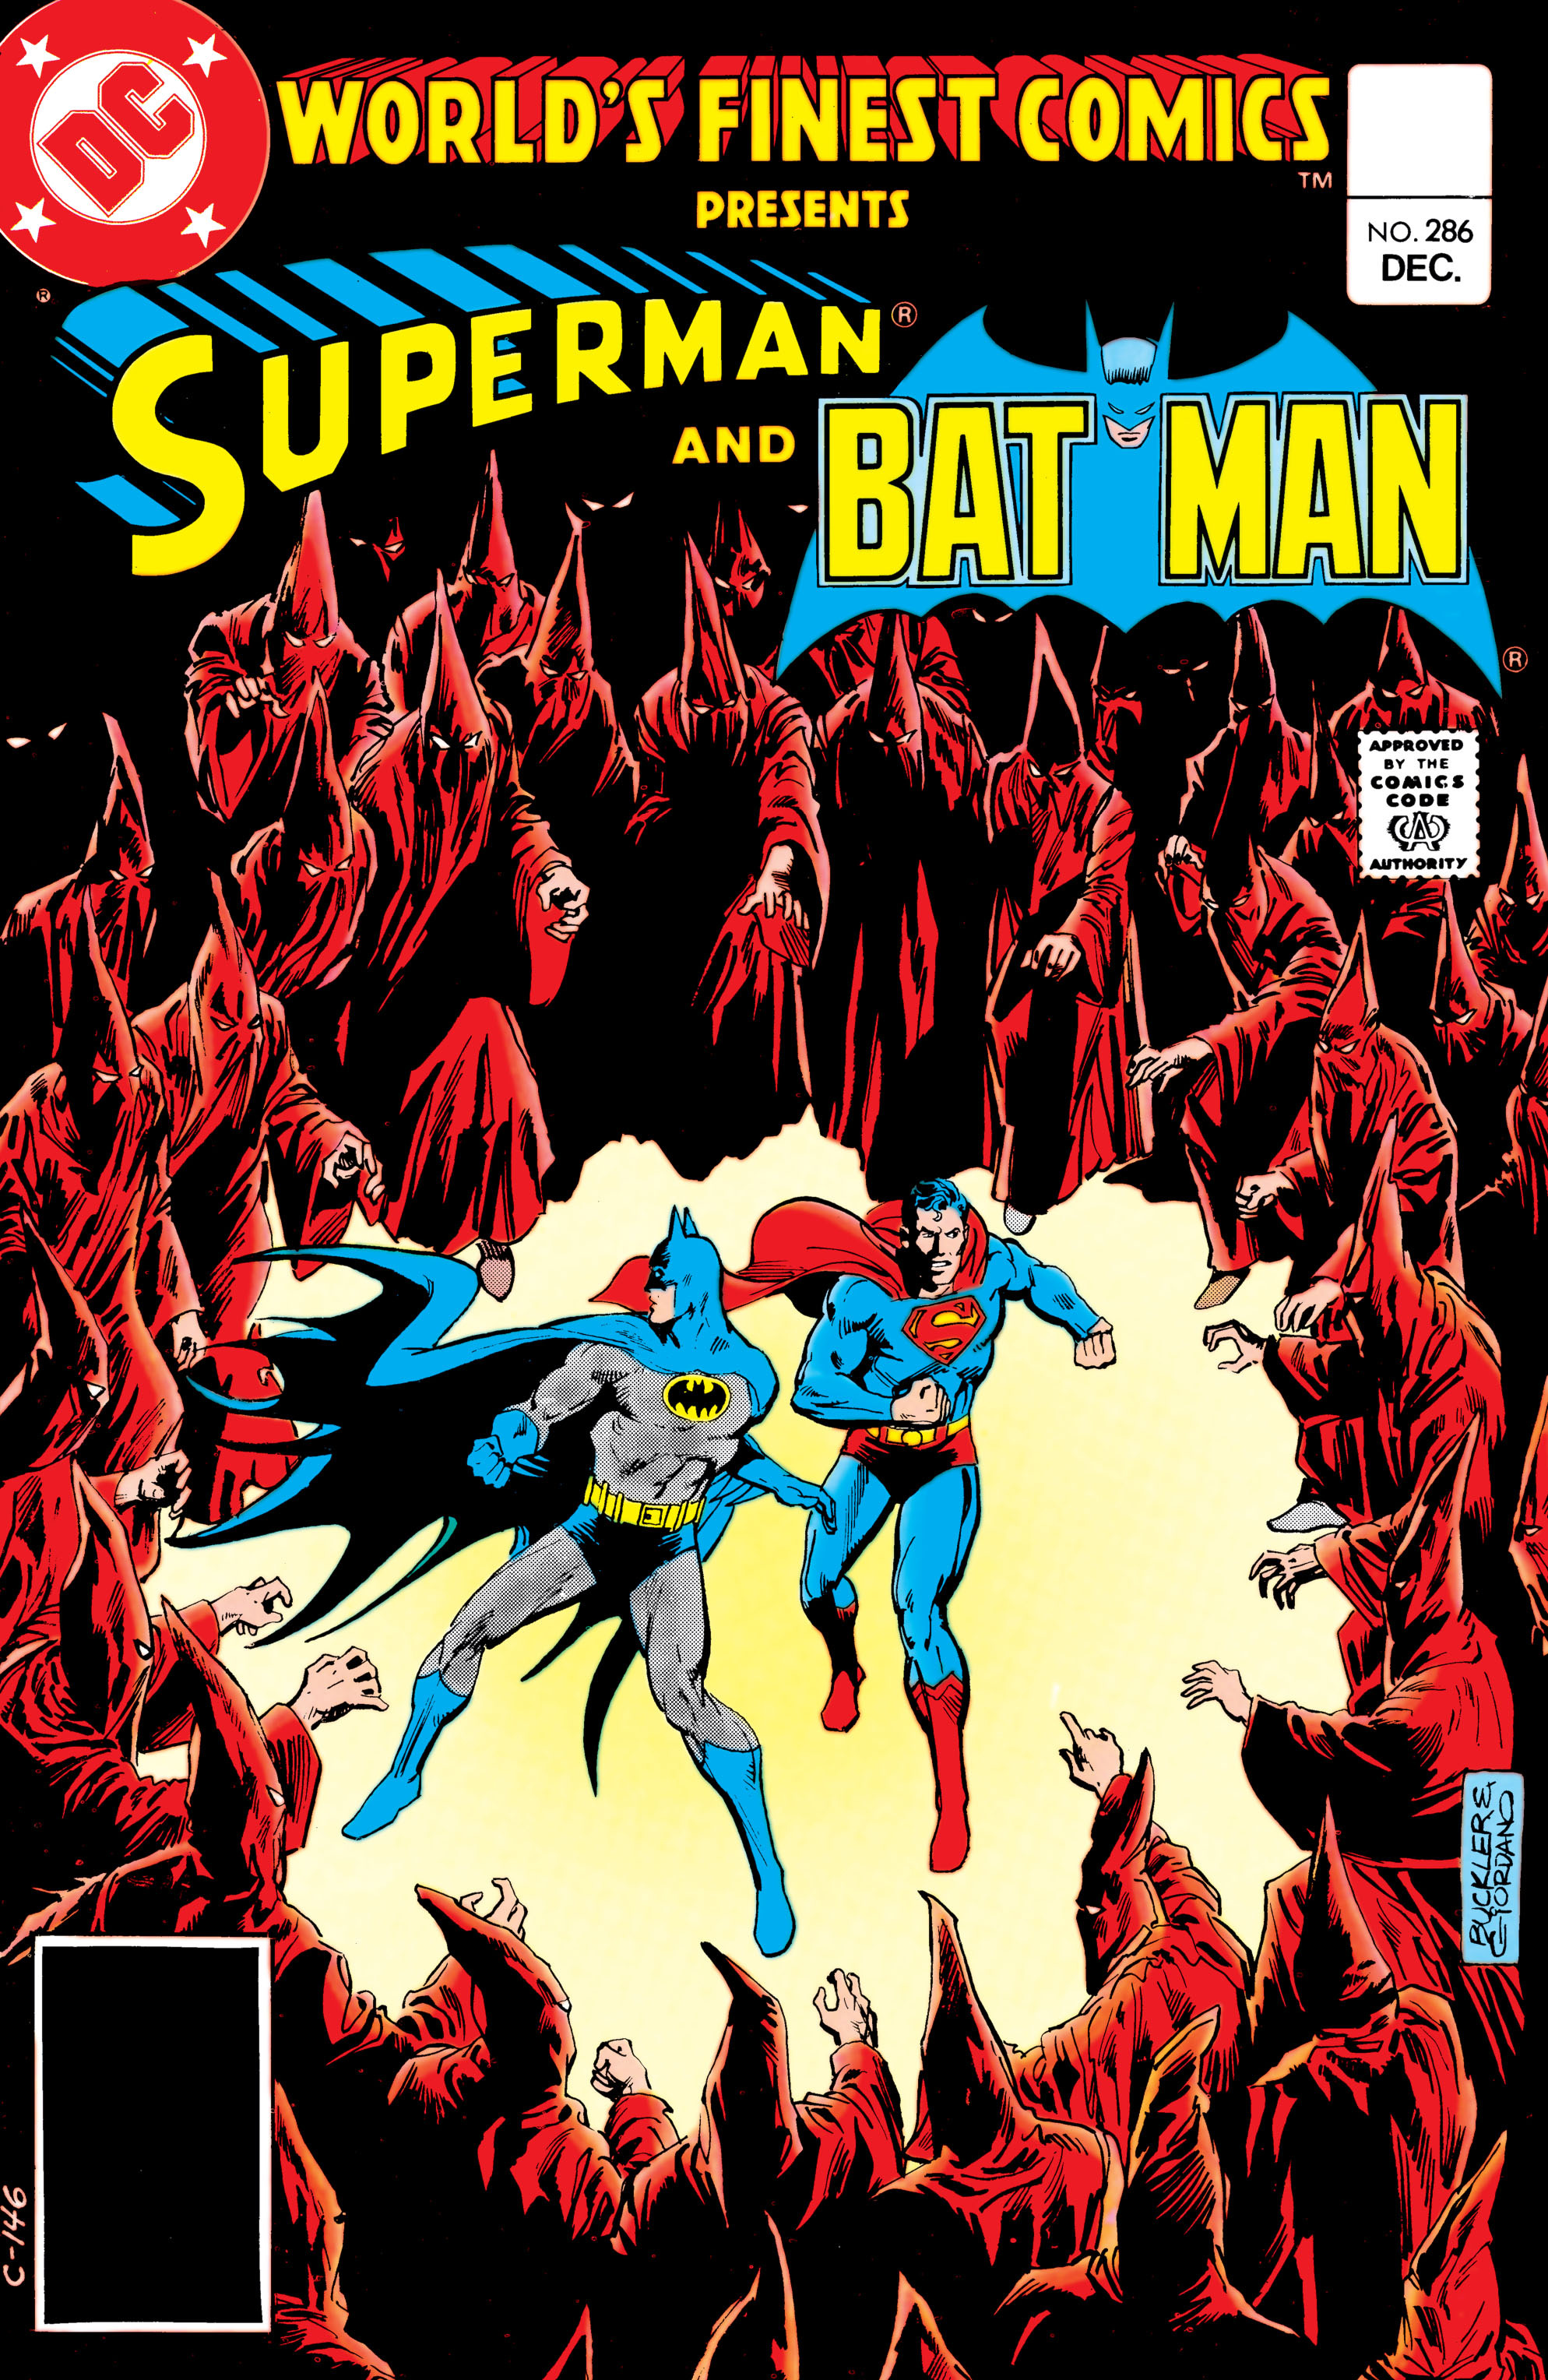 Read online World's Finest Comics comic -  Issue #286 - 1